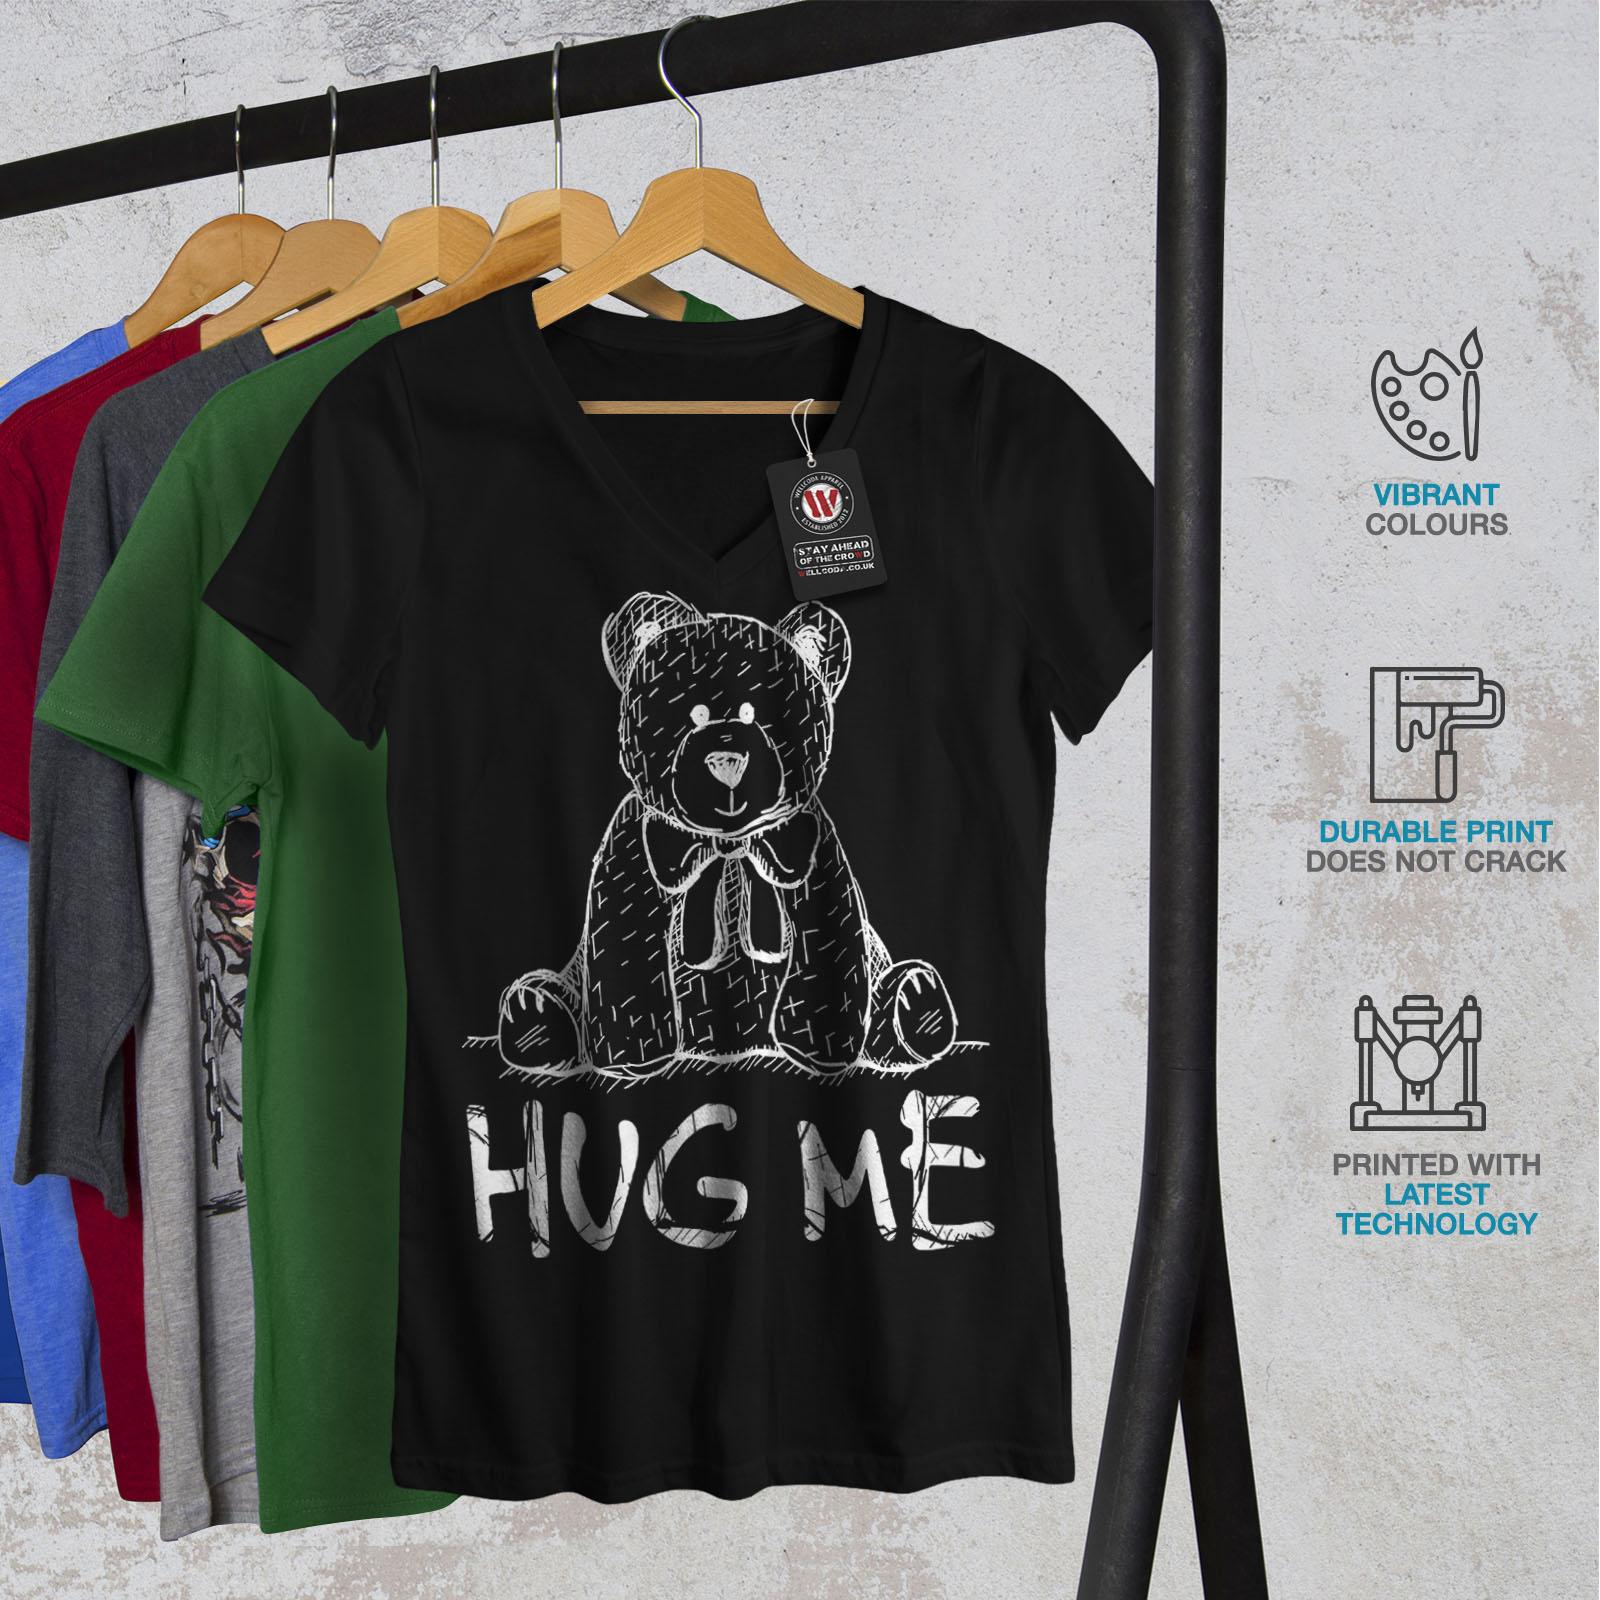 miniature 4 - Wellcoda Hug Me Teddy Bear Womens V-Neck T-shirt, Nice & Graphic Design Tee